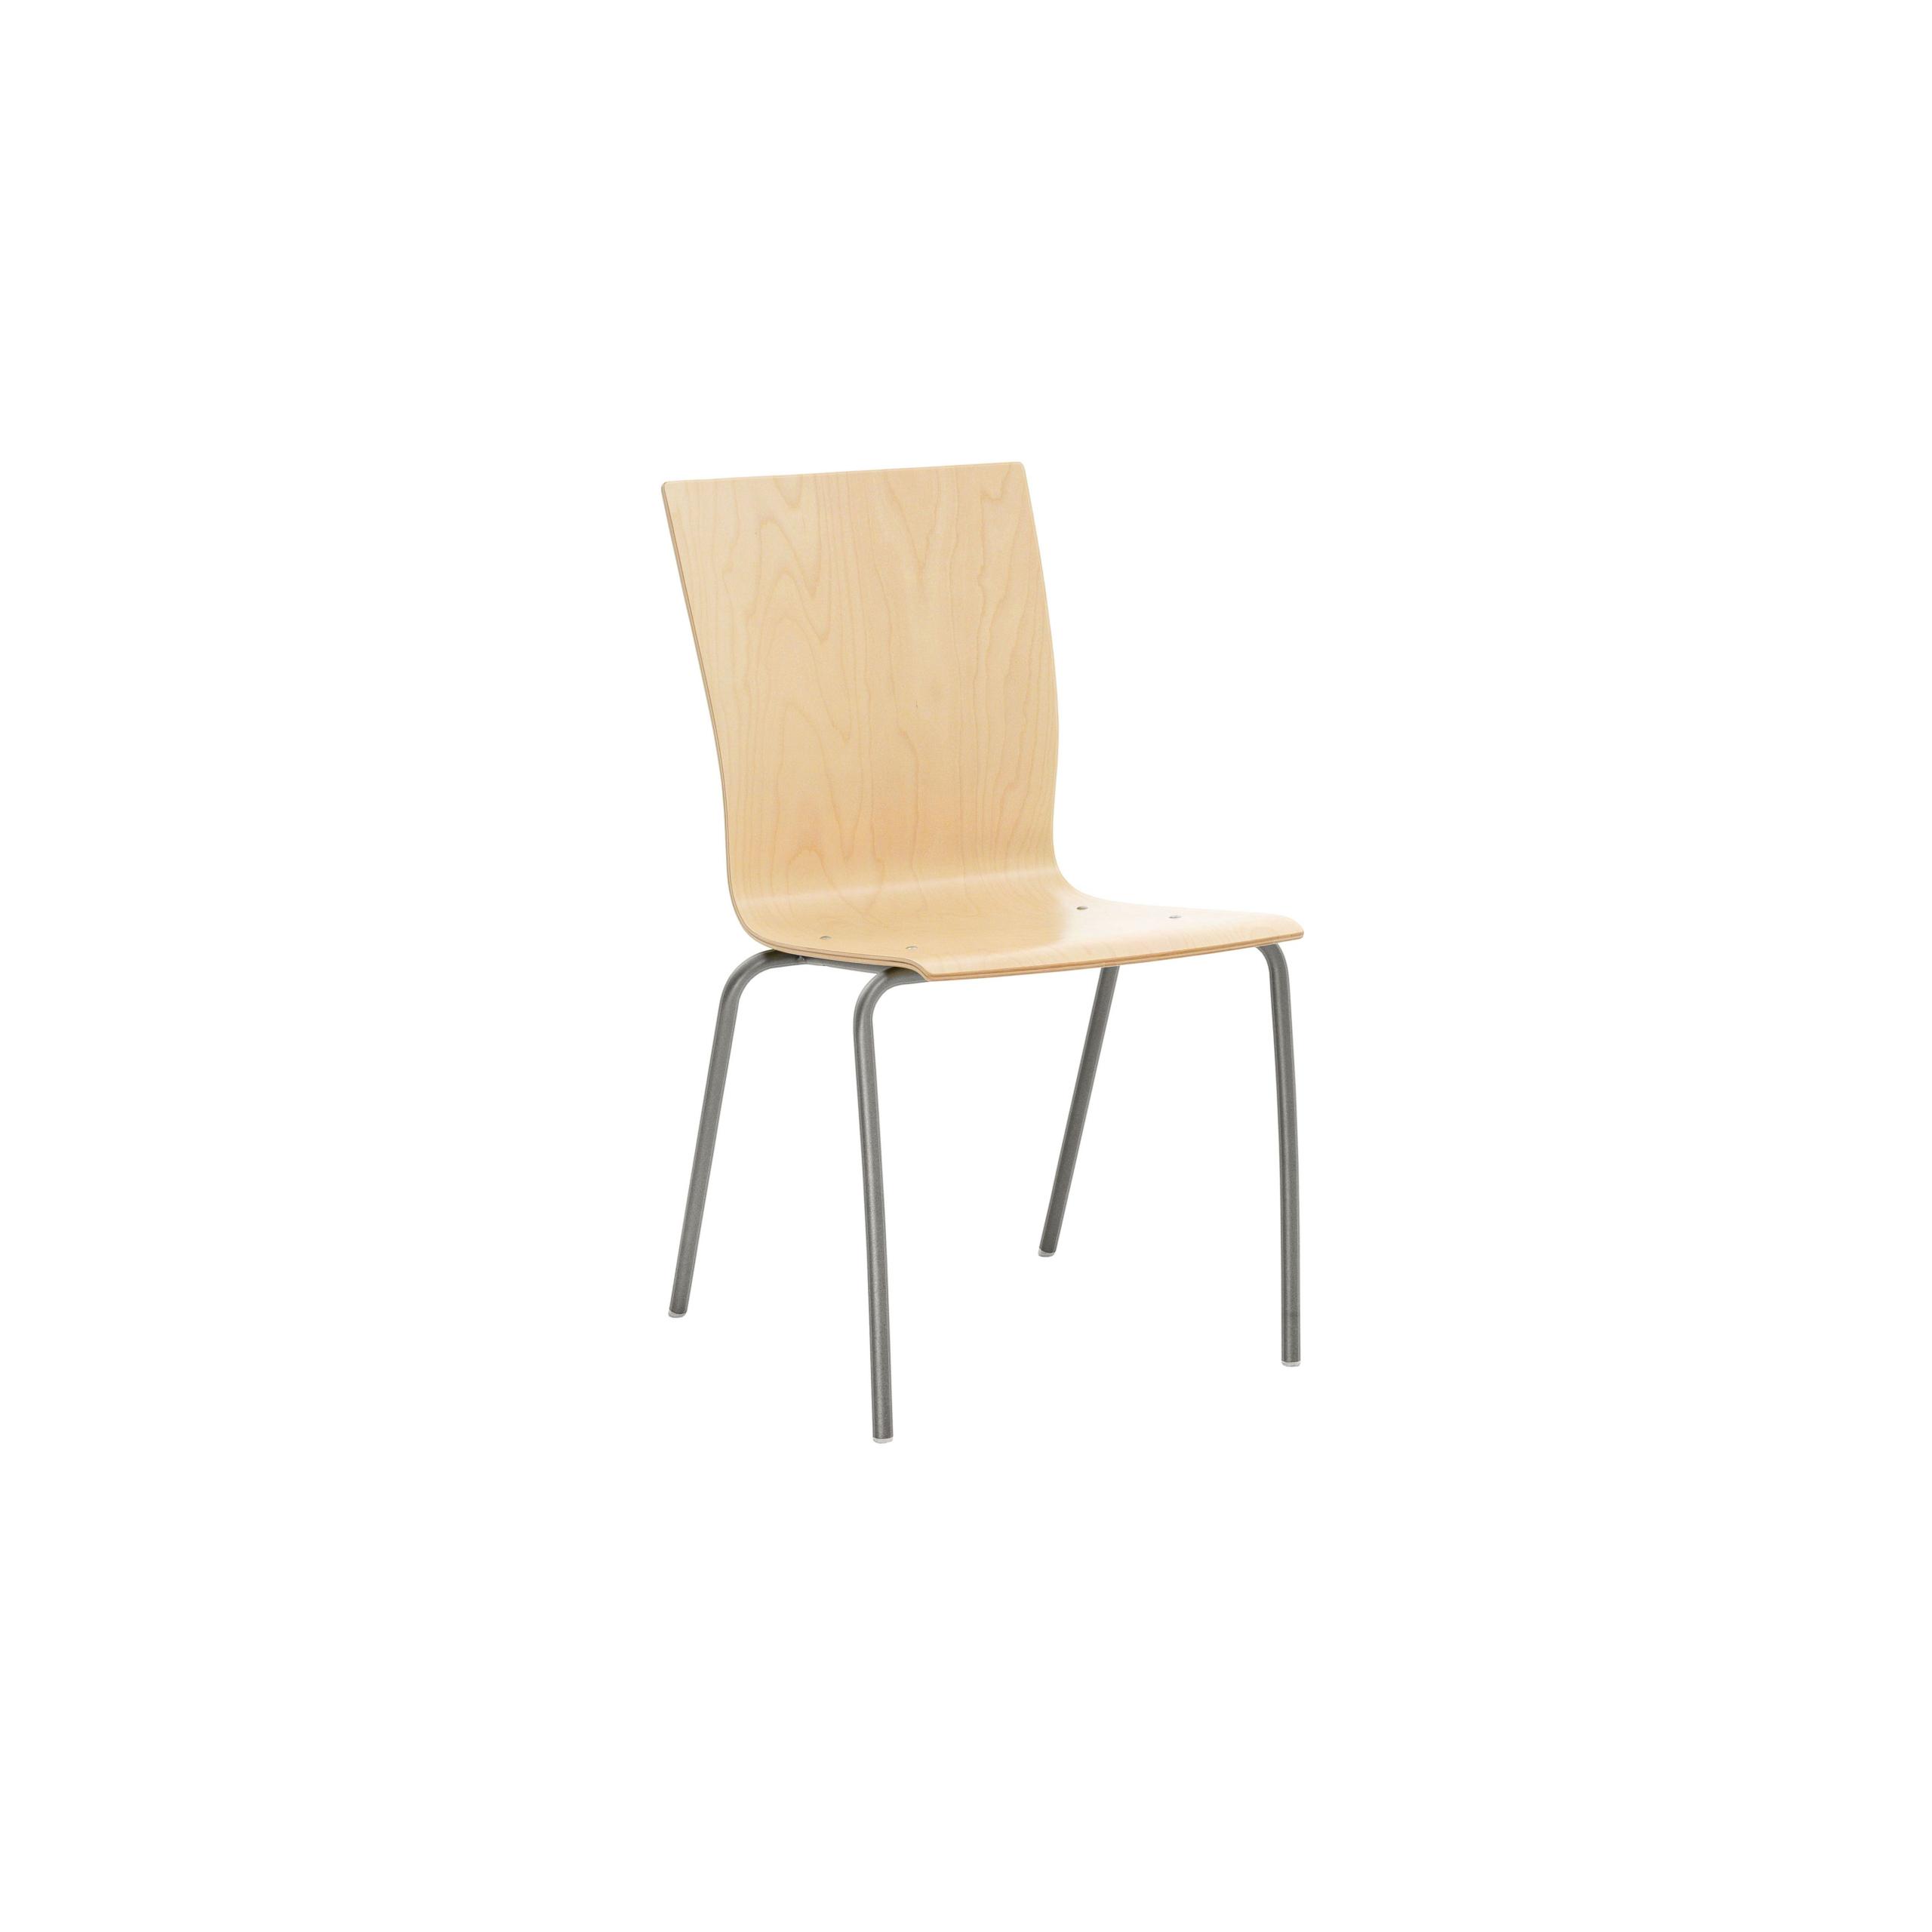 Sit Stol med metallben produktbild 1